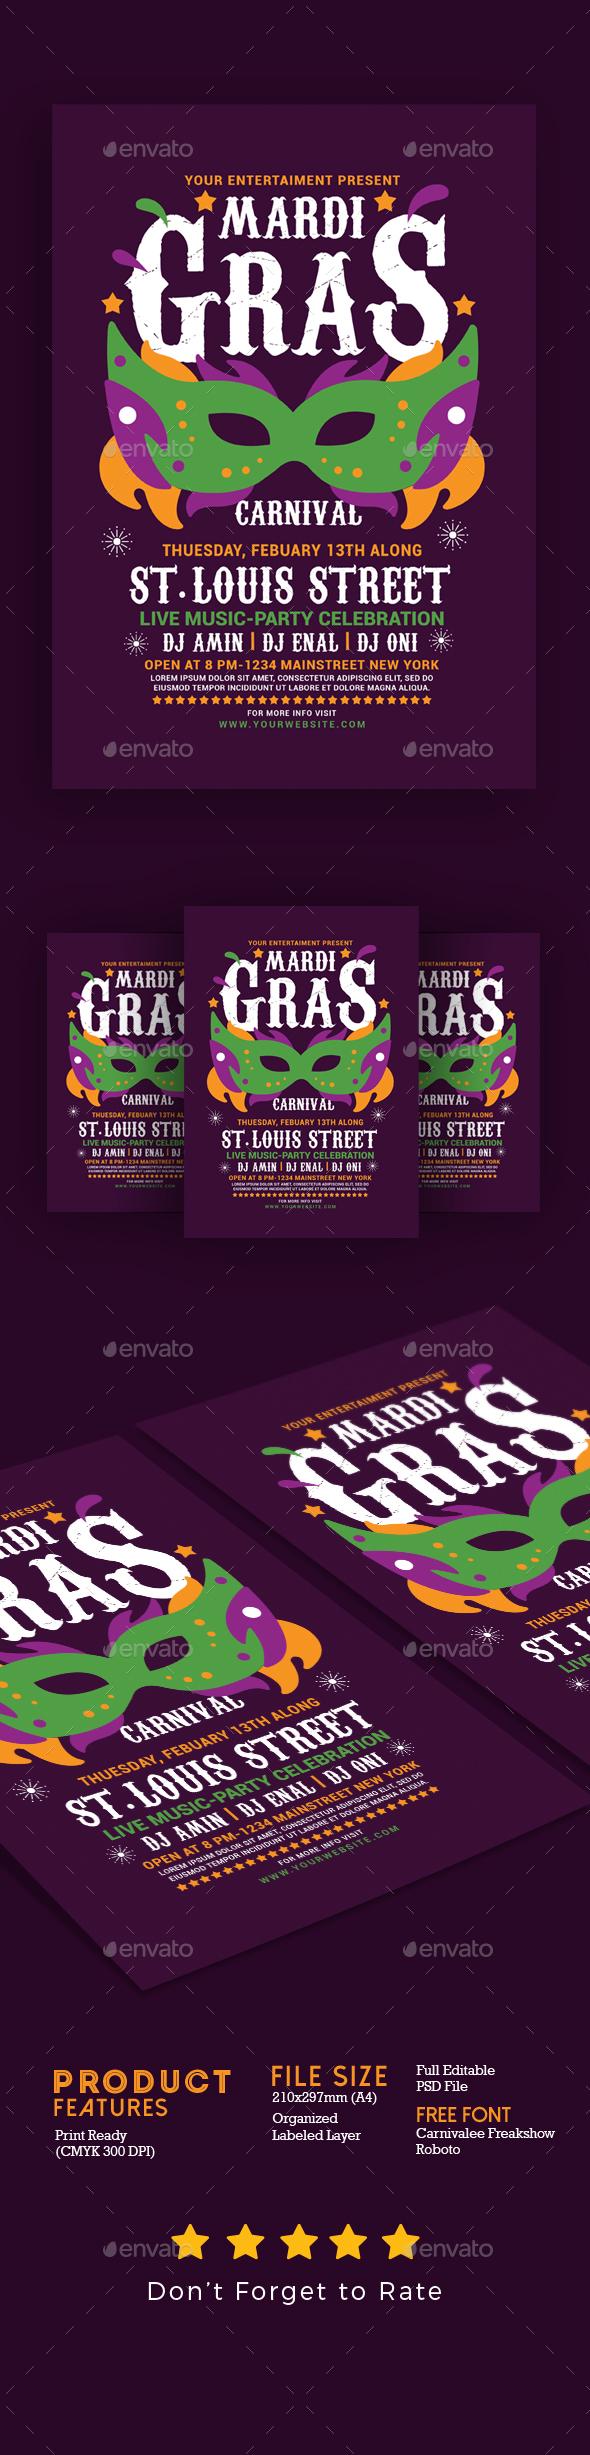 Mardi Gras Flyer Template - Events Flyers